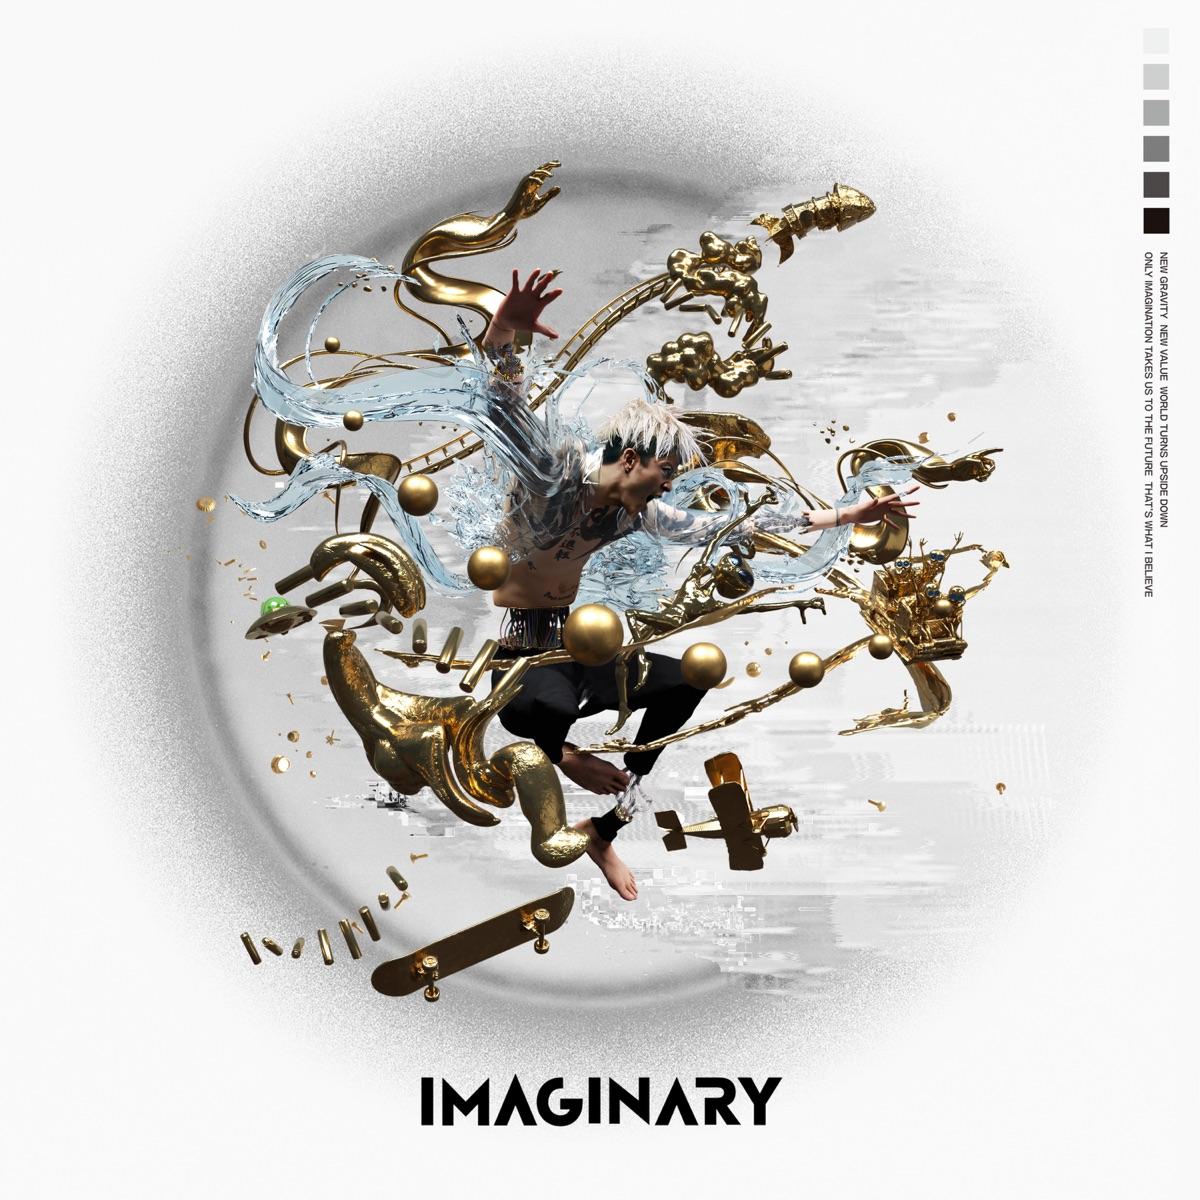 『MIYAVI - Imaginary (feat. キンブラ)』収録の『Imaginary』ジャケット